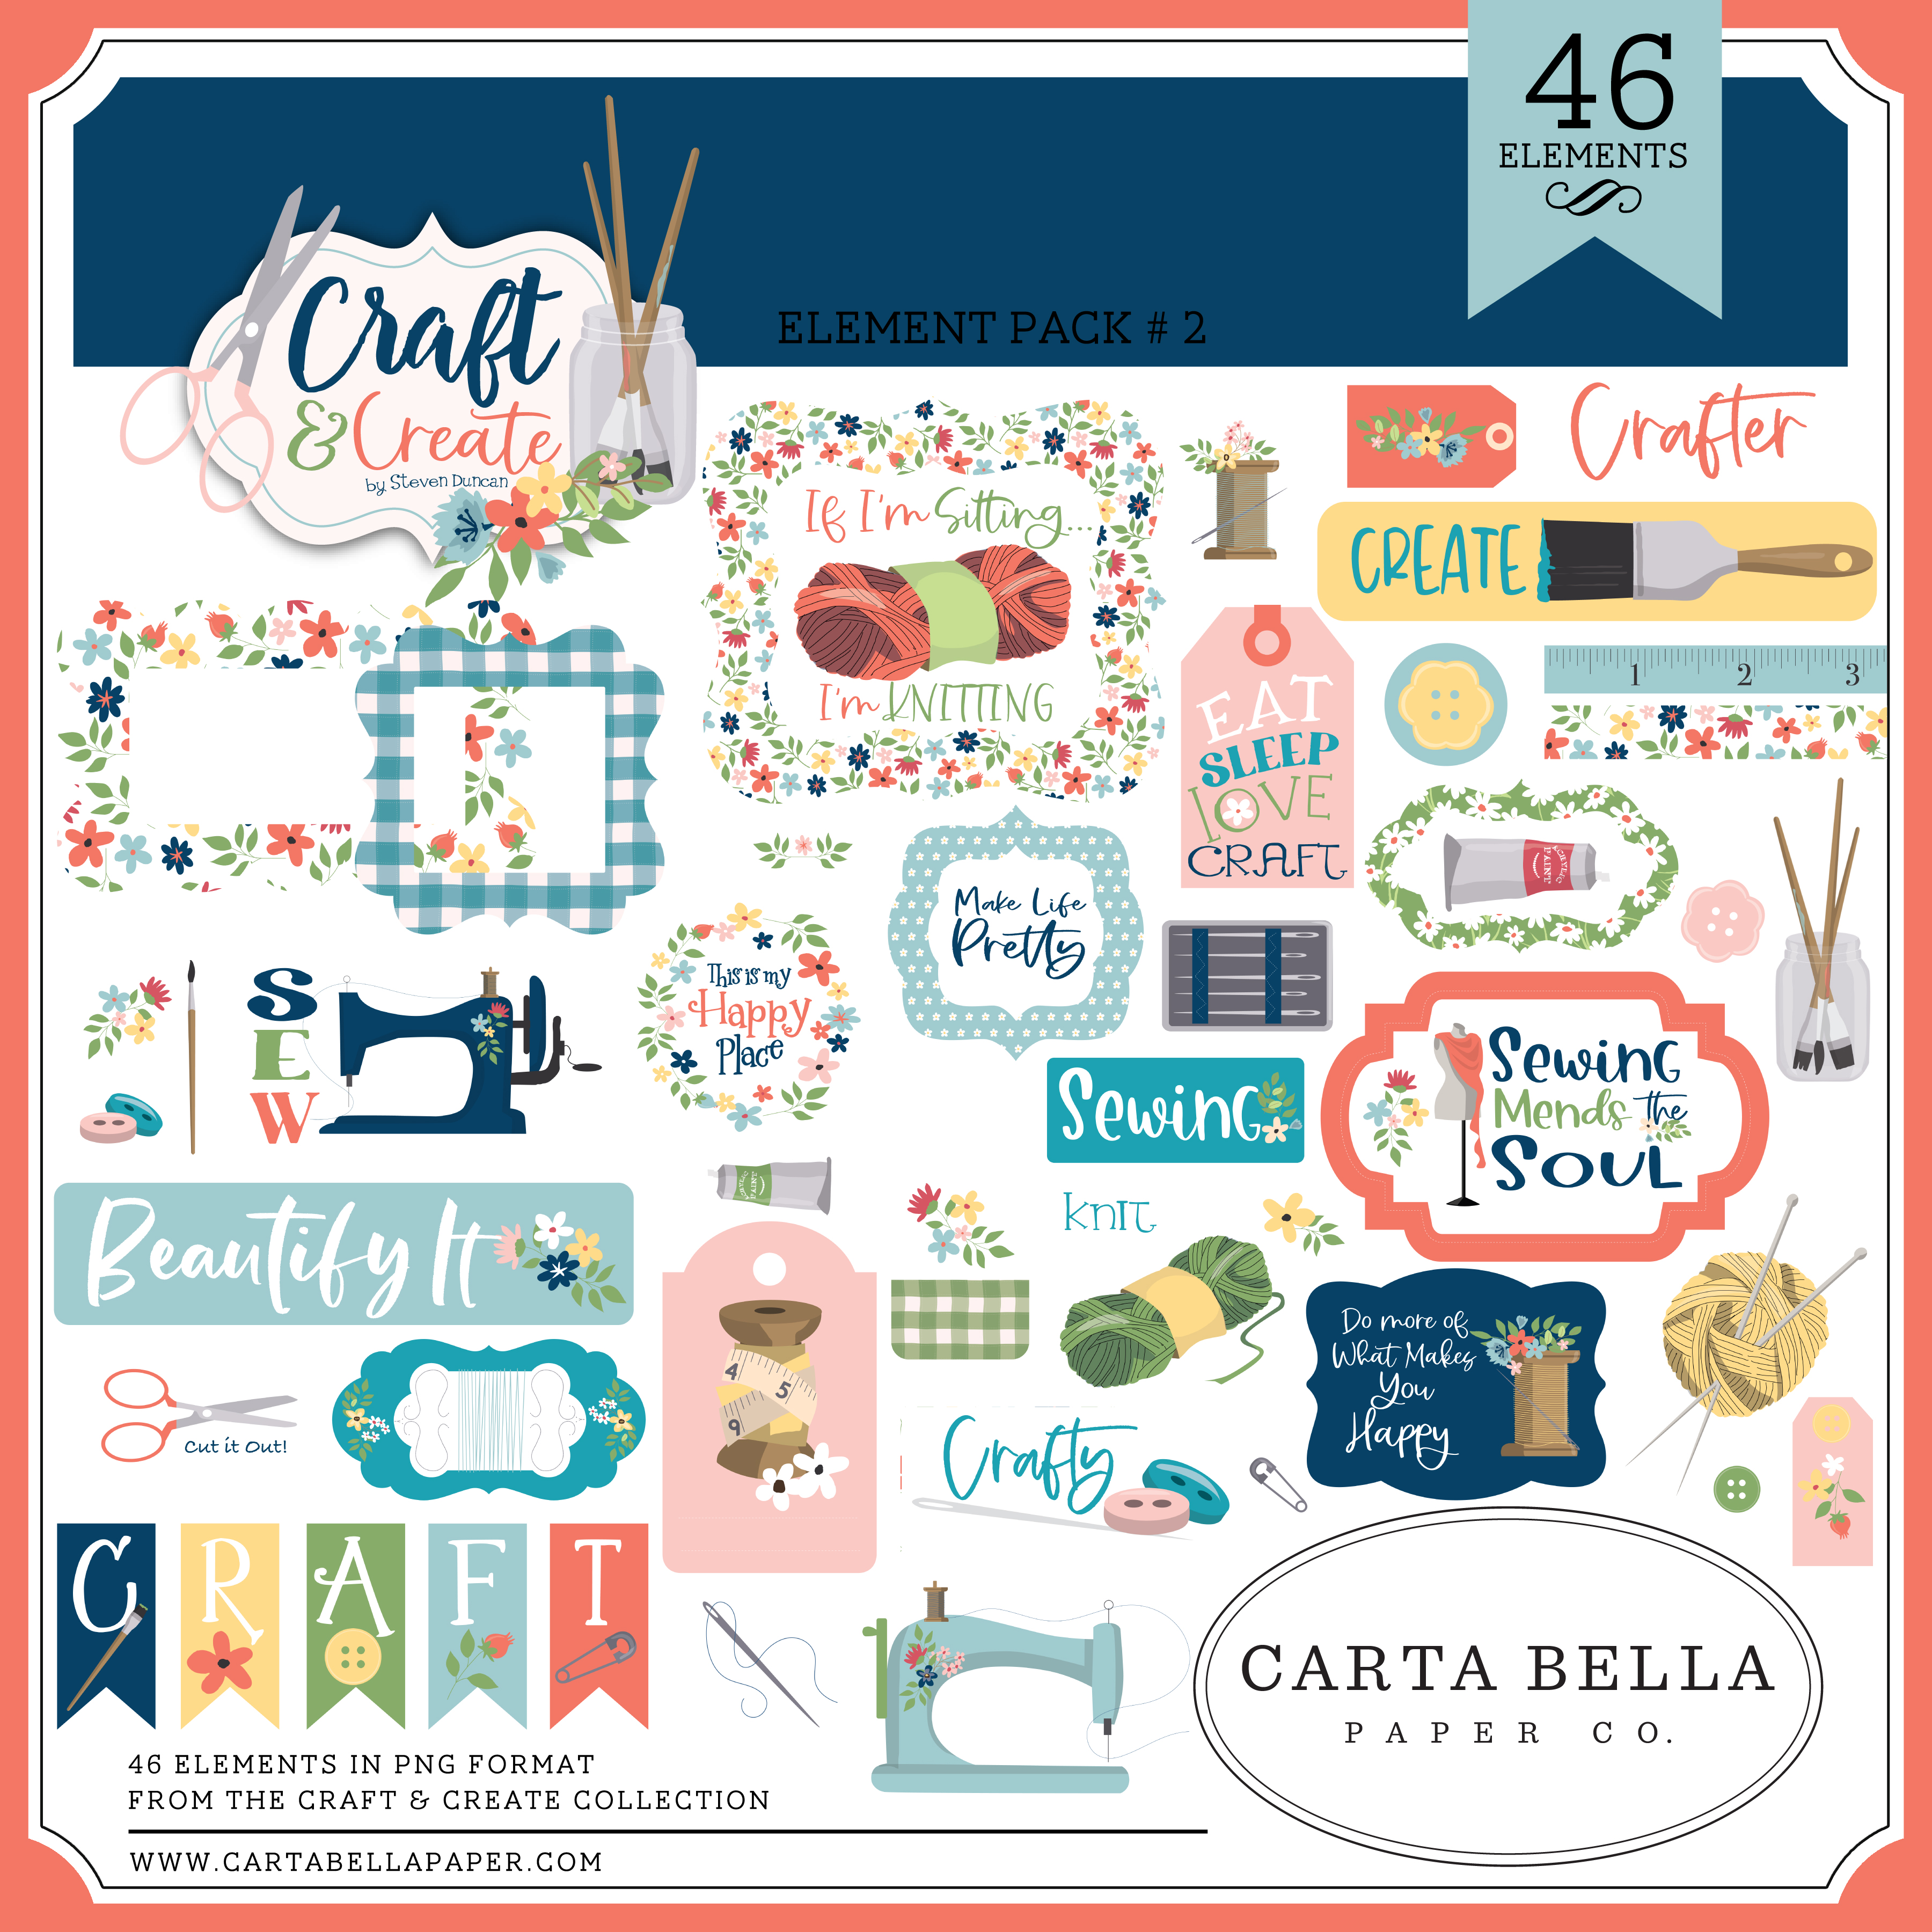 Craft & Create Element Pack #2